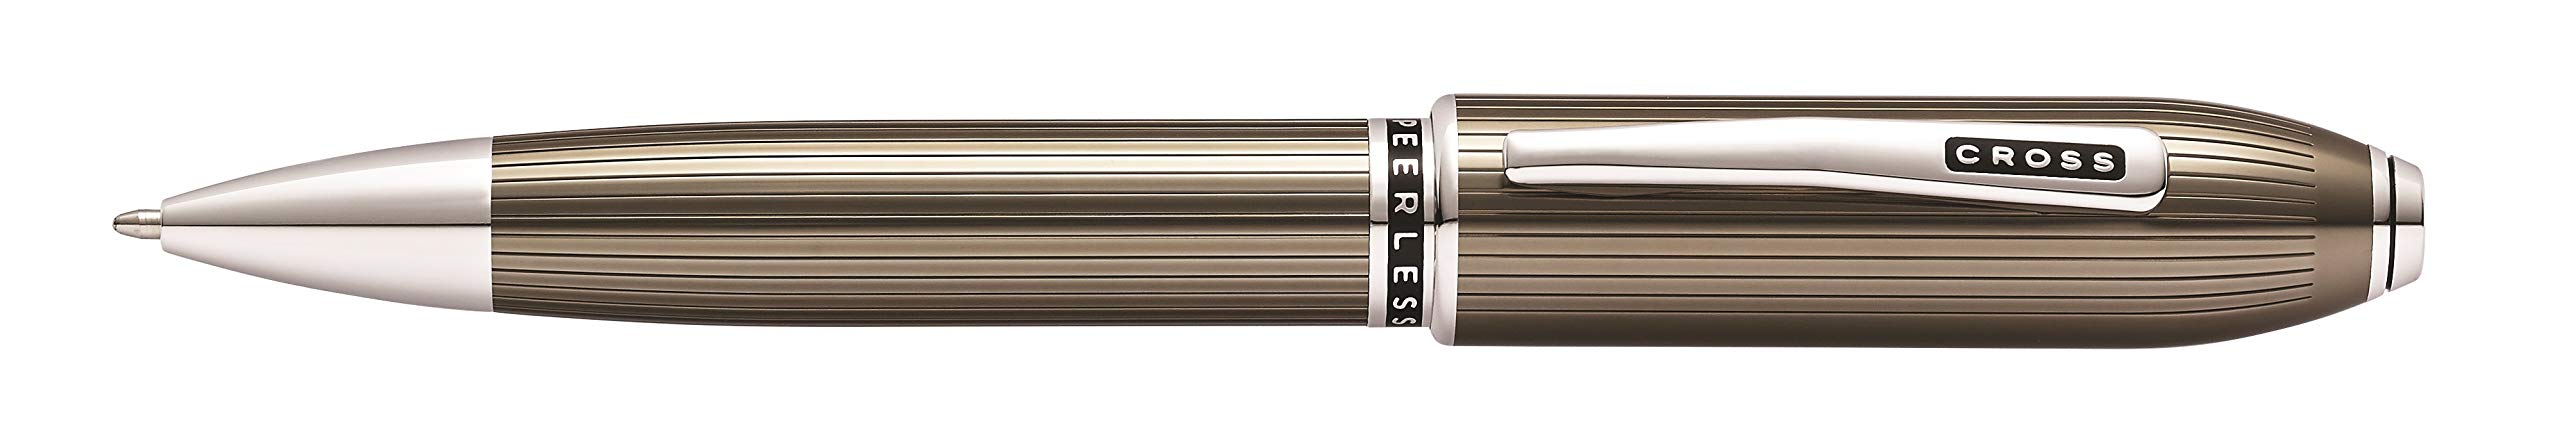 Cross Peerless Translucent Titanium Gray Ballpoint Pen by Cross (Image #1)